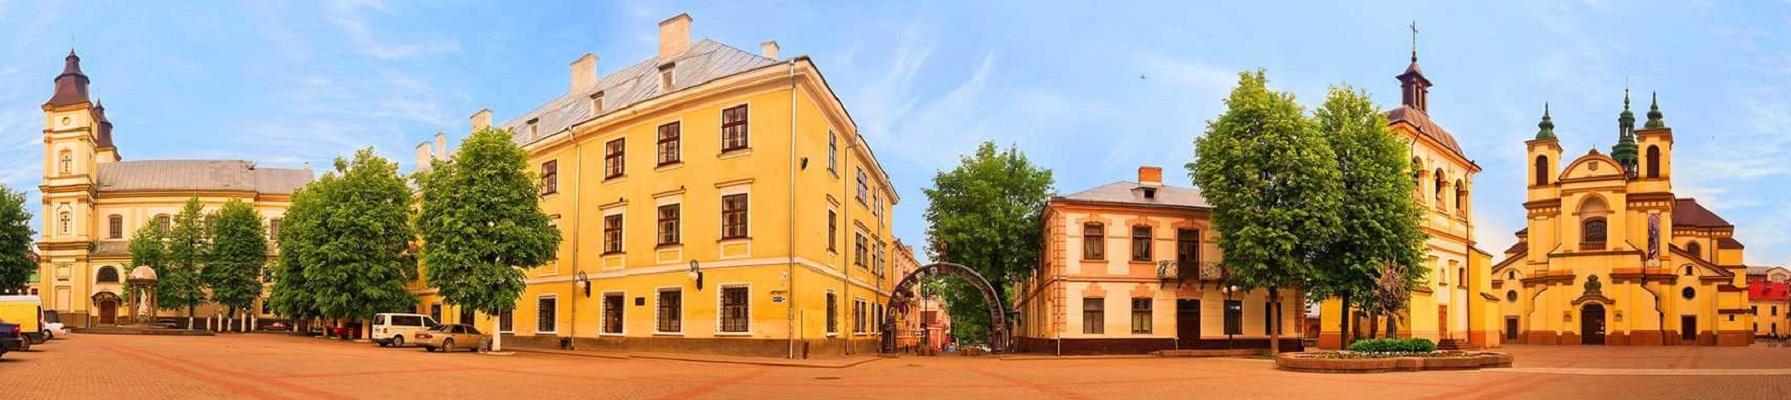 ivano-frankivsk-majdan-sheptytskoho